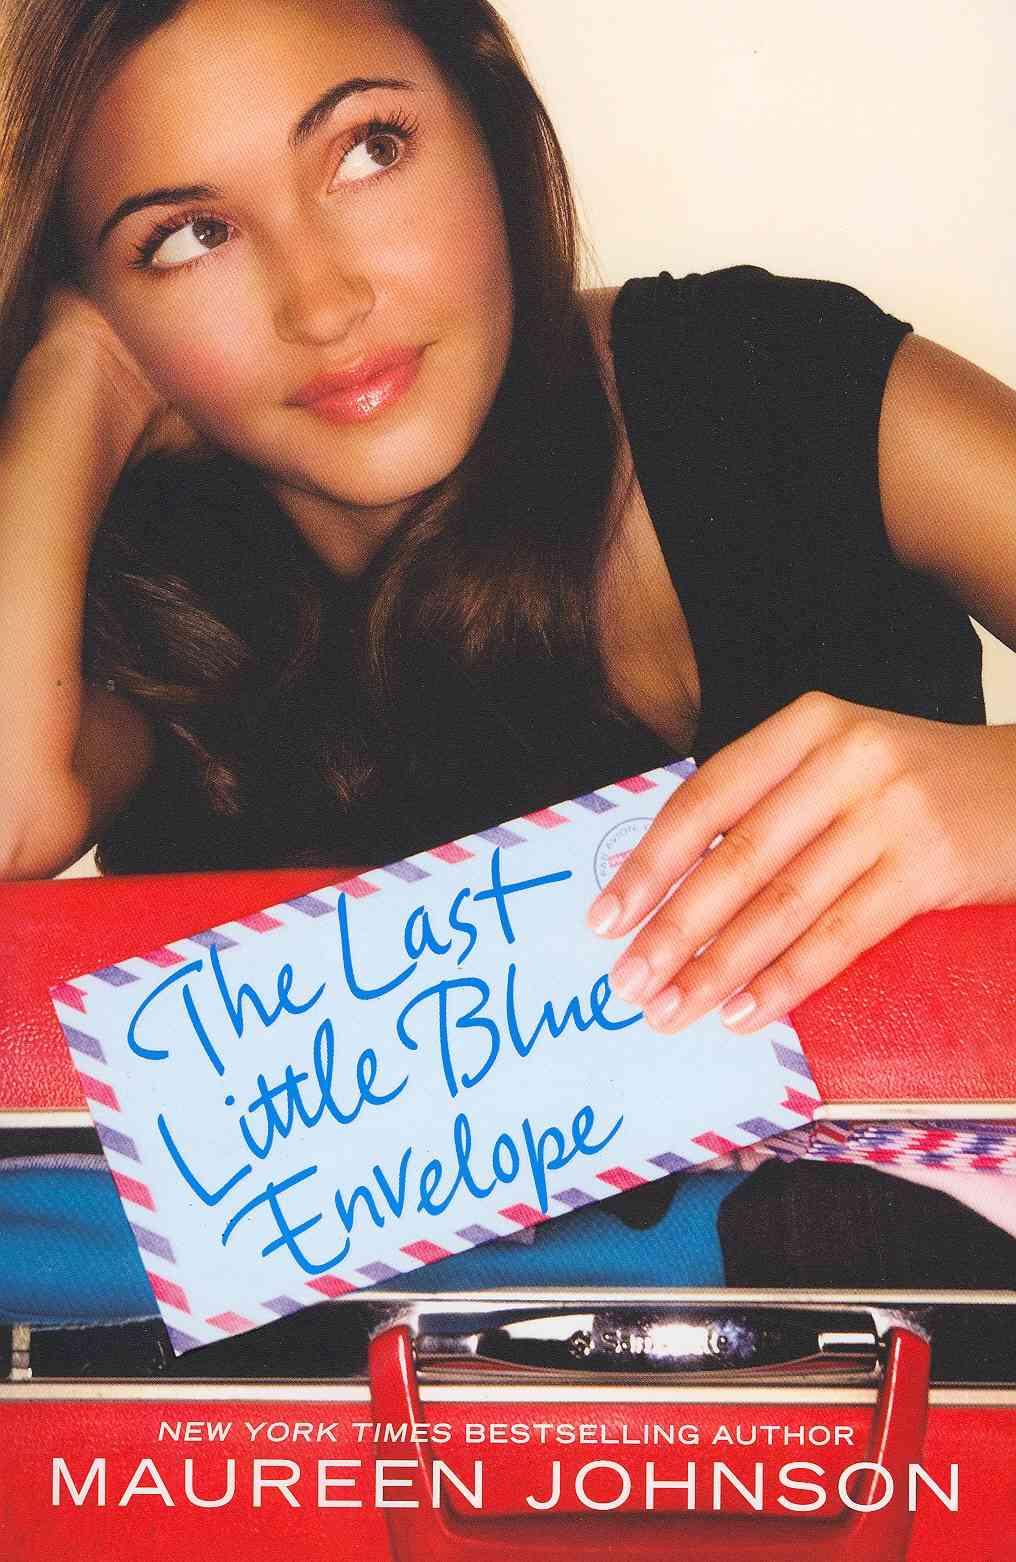 The Last Little Blue Envelope (Paperback)